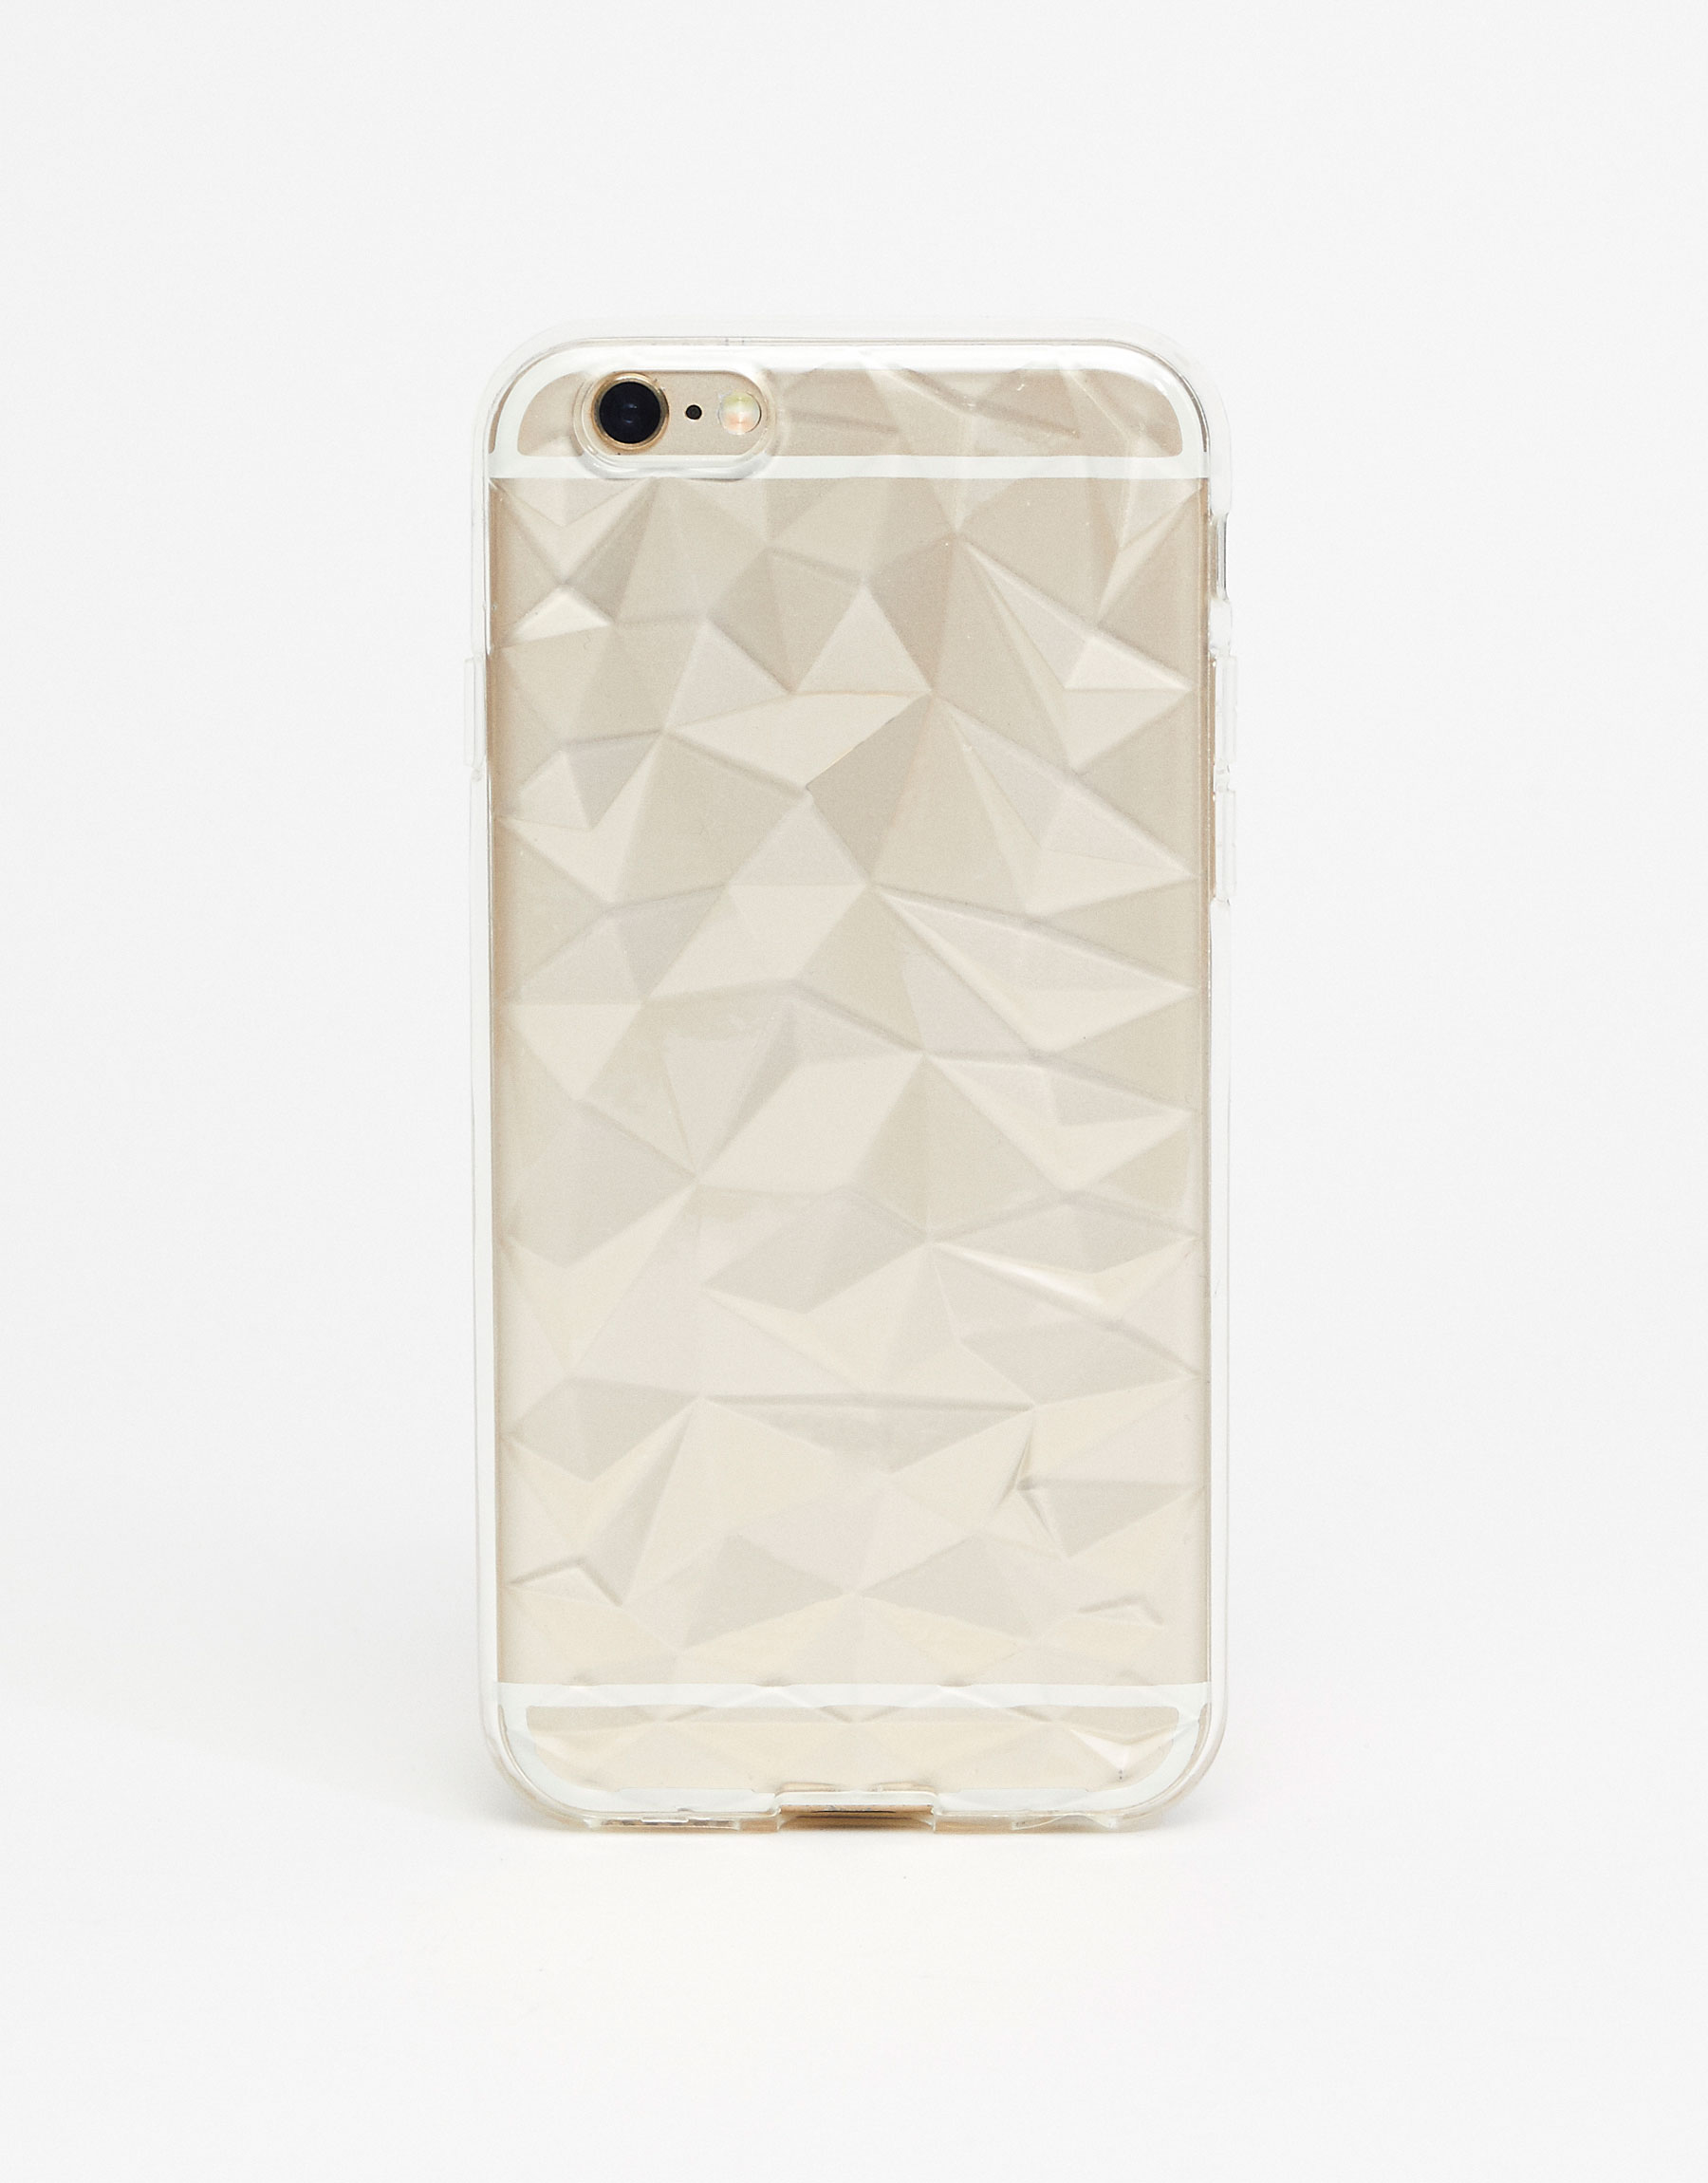 Capa de iPhone tipo diamante